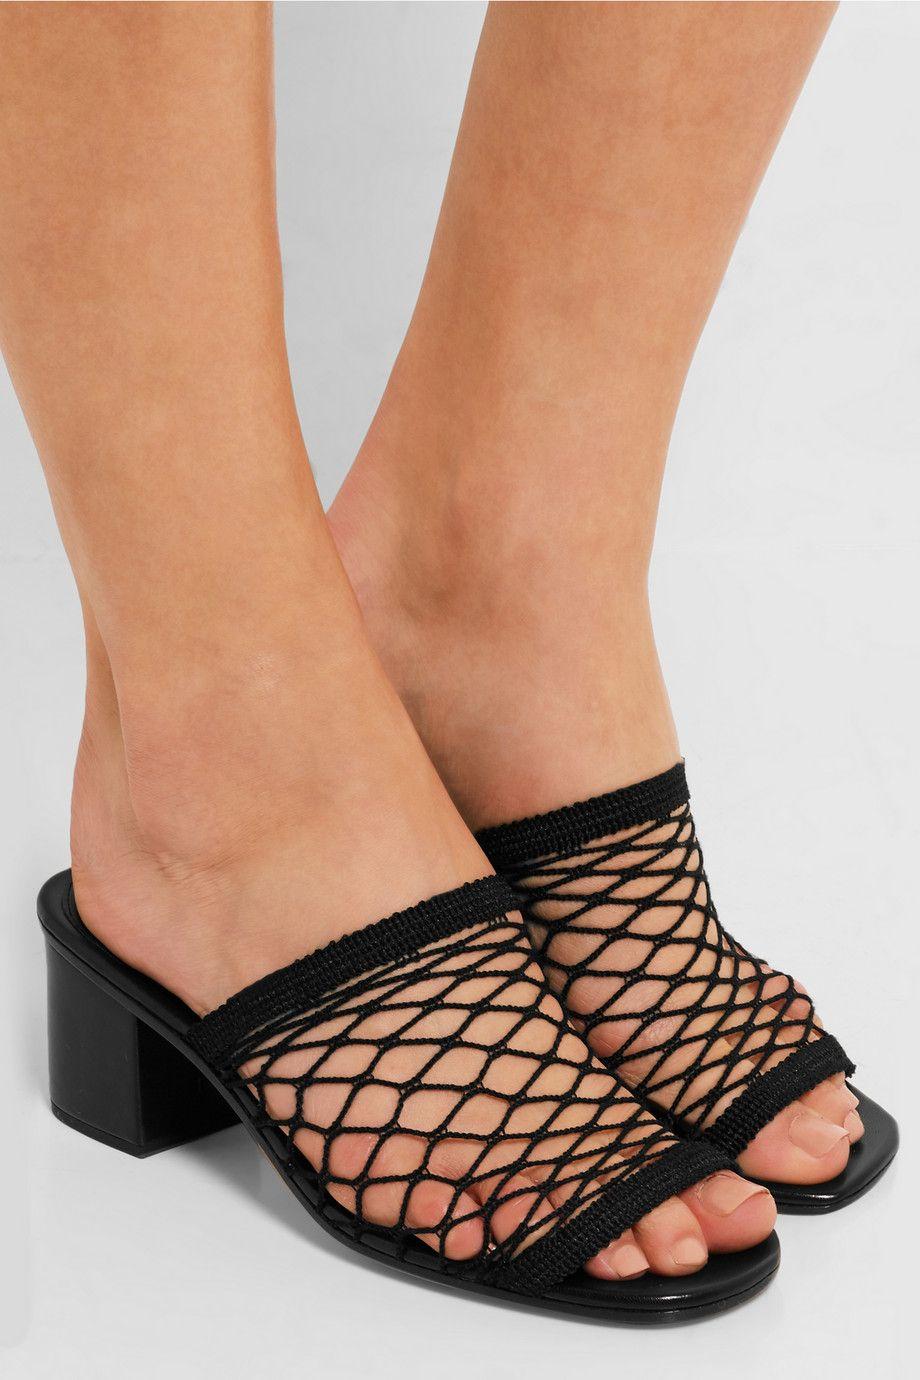 059c62218d7 COM Minimal Shoes